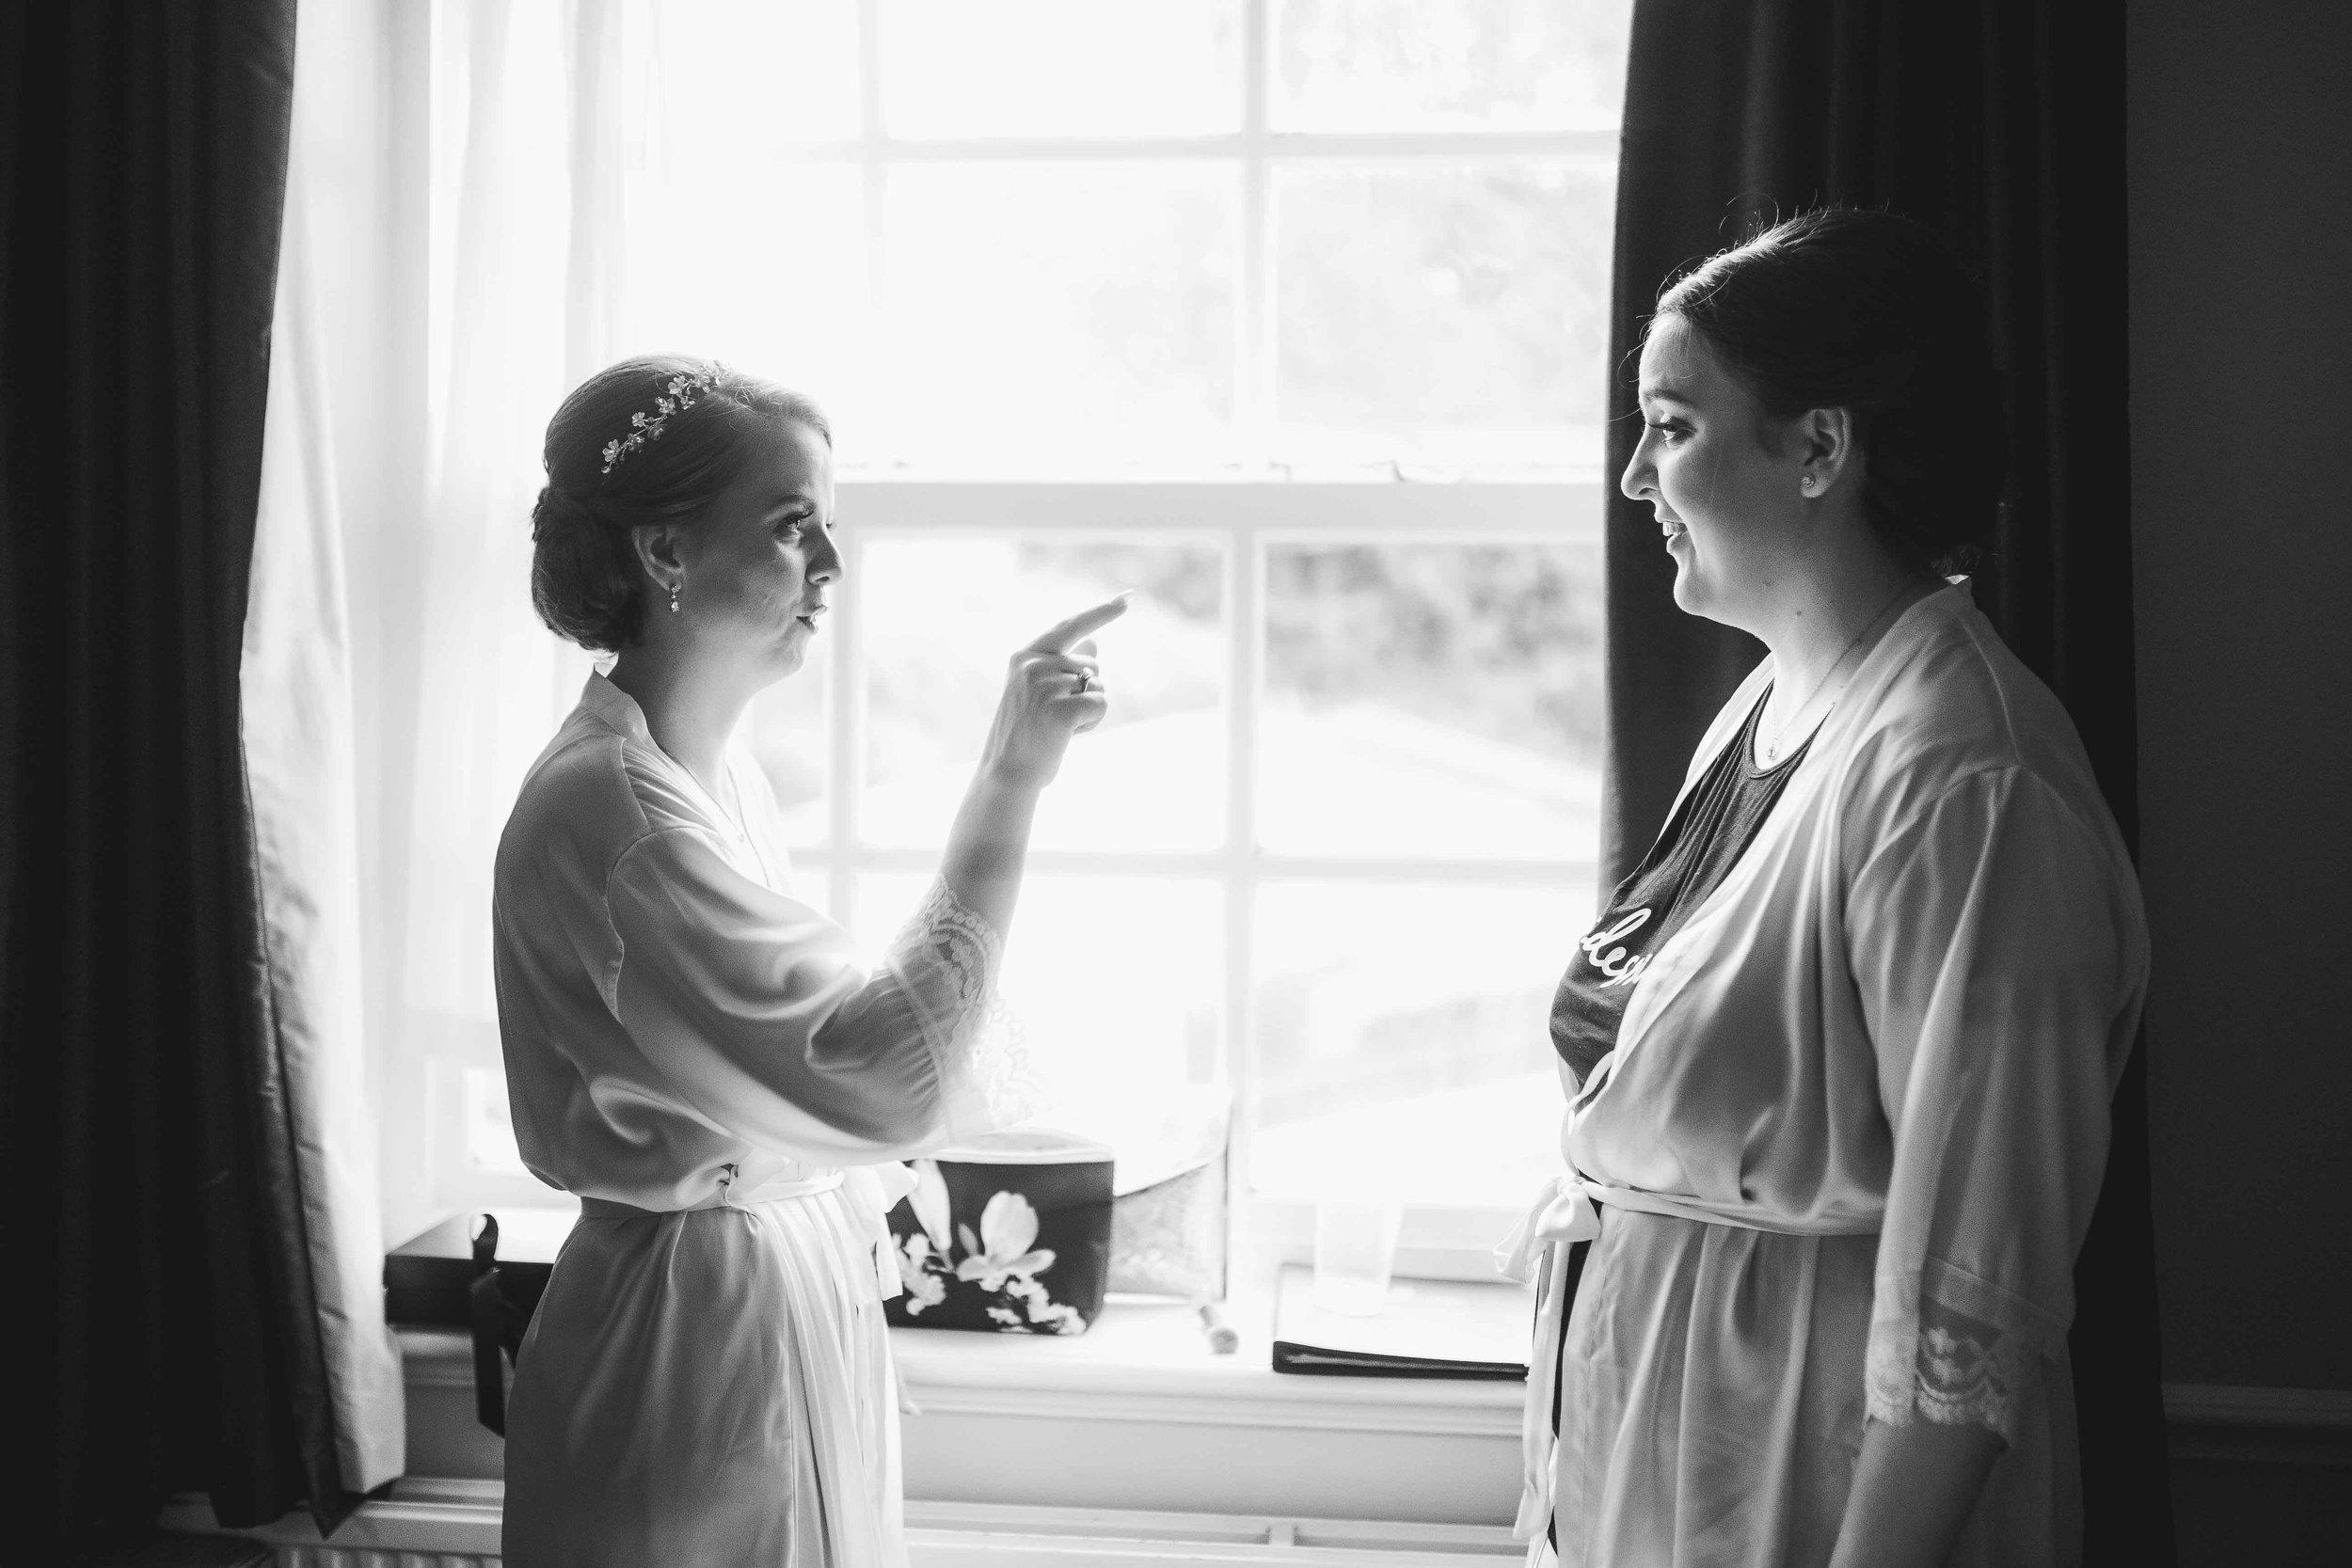 Lea-cooper-photography-willenhall-wolverhampton-wedding-photographer-birmingham-shirley-west-midlands-ceremony-church-2.JPG